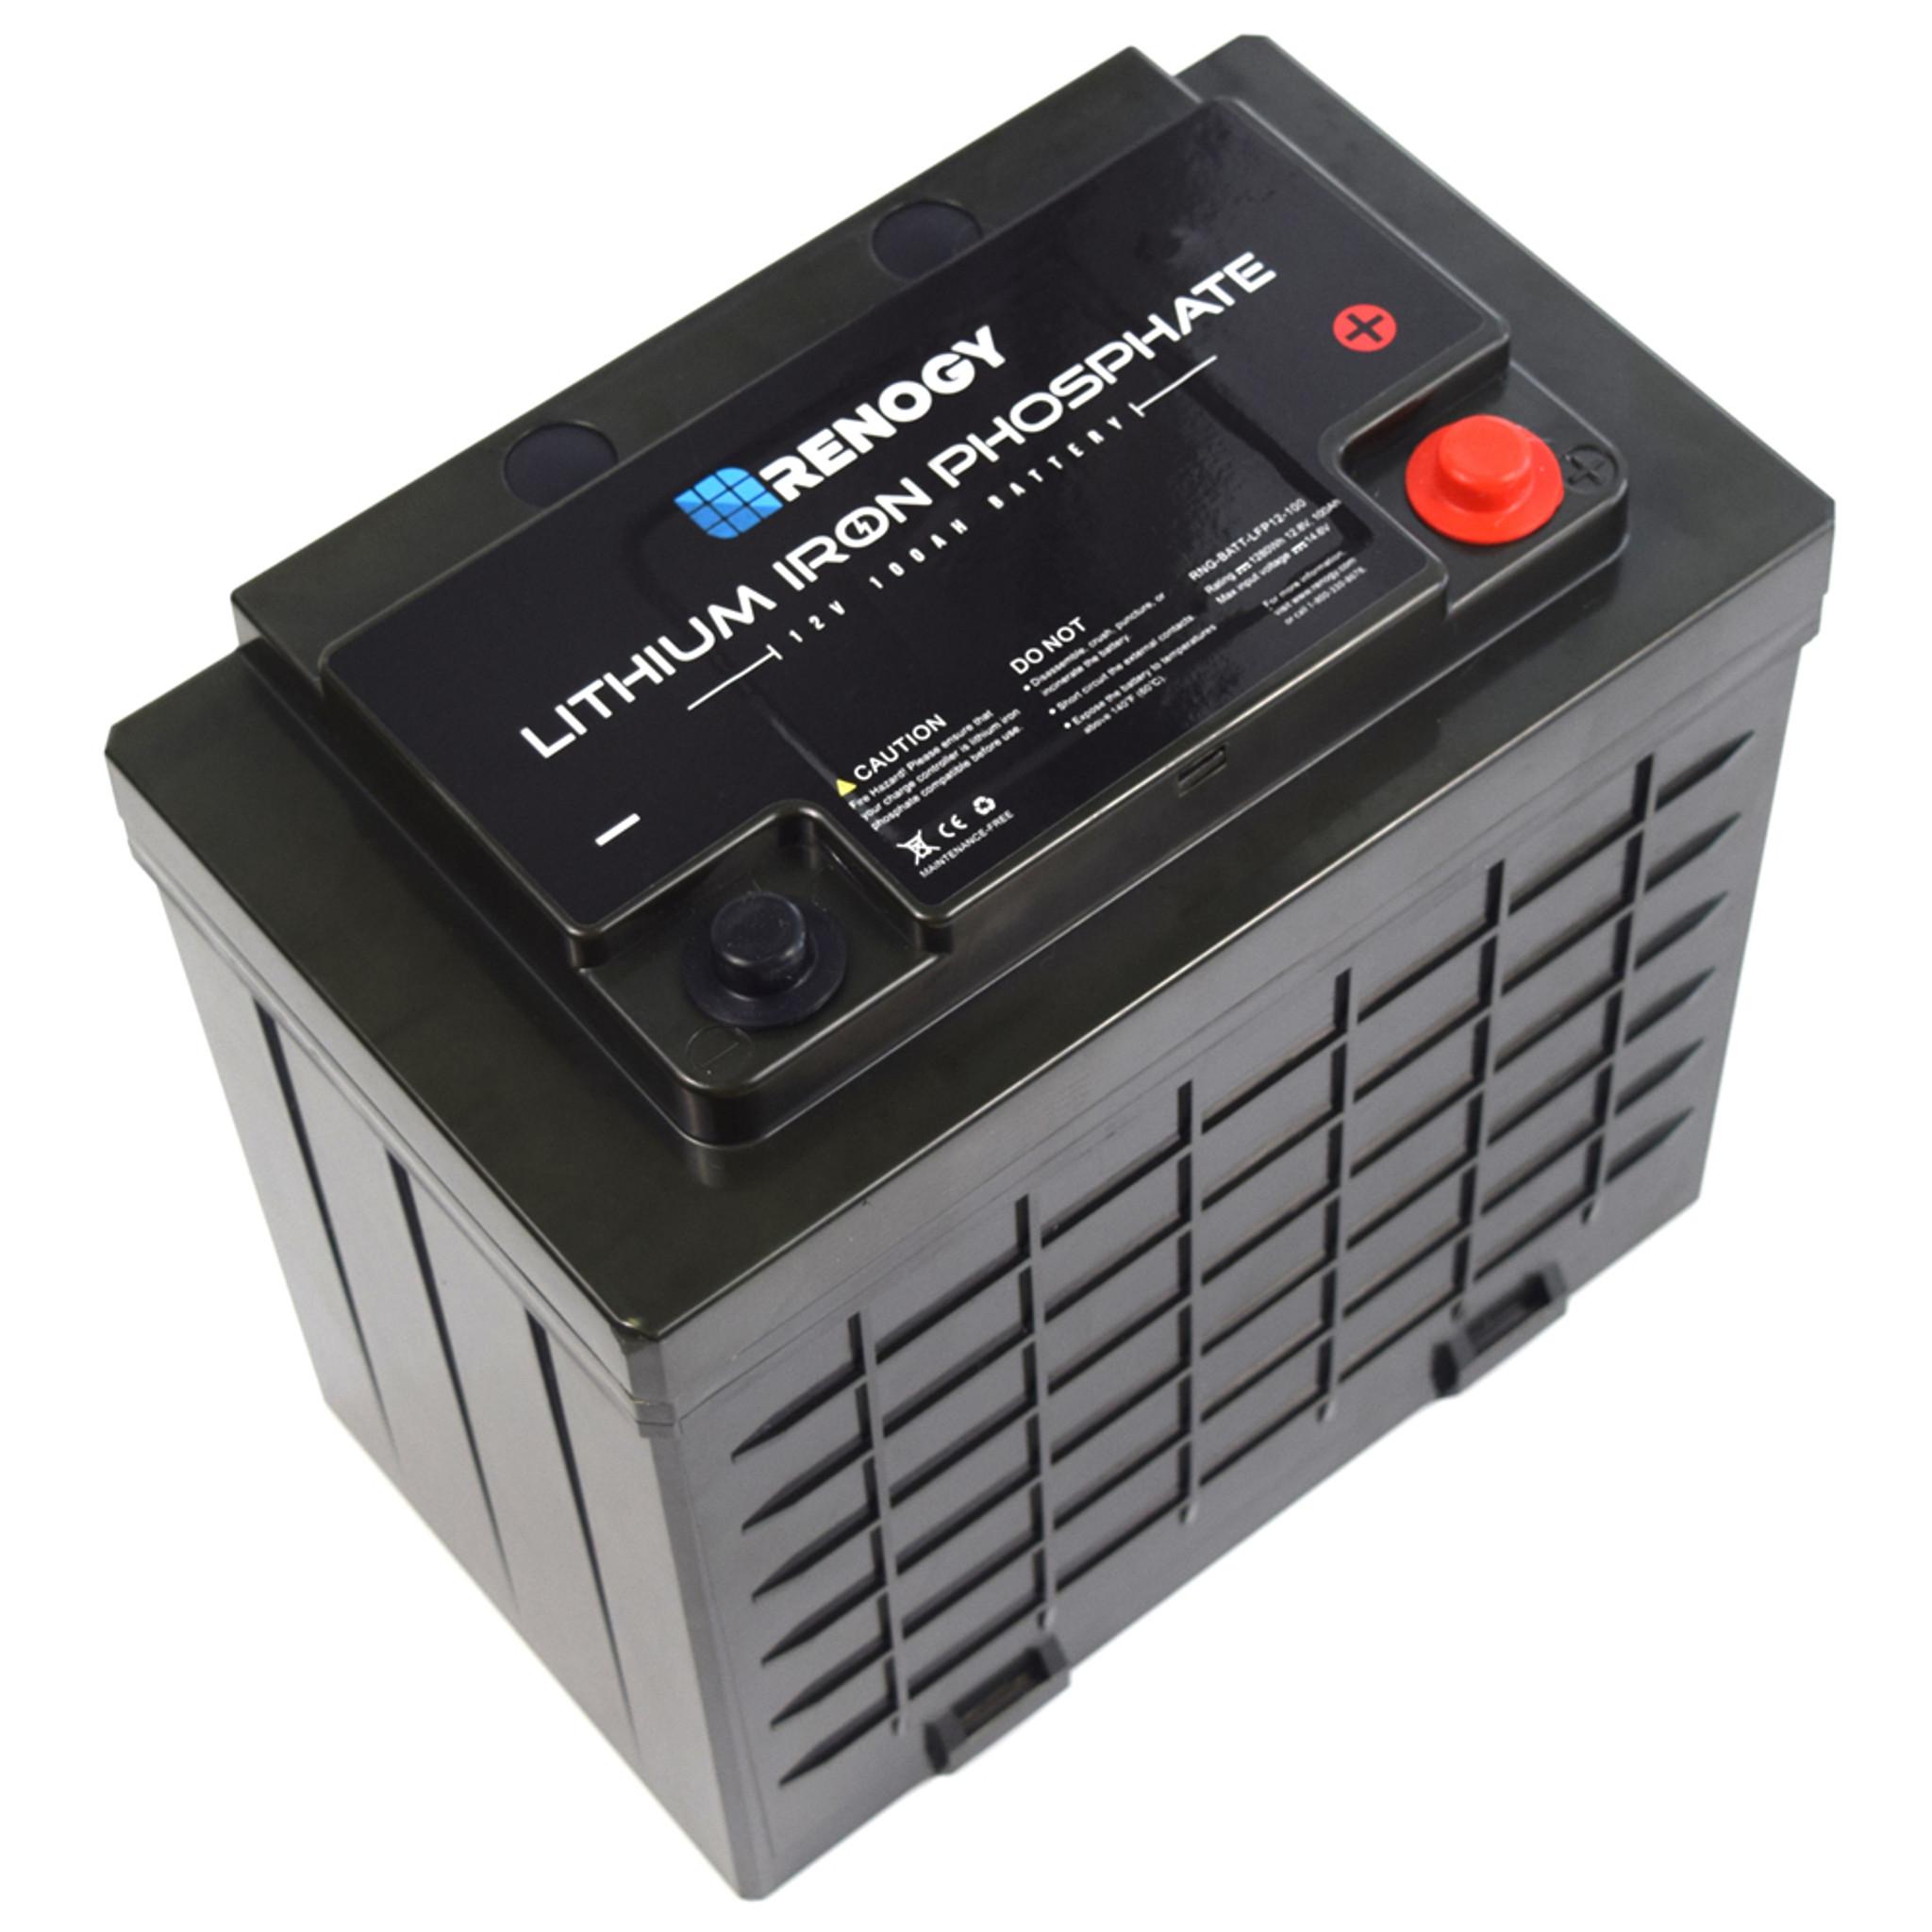 Renogy Lithium-Iron Phosphate Battery 12 Volt 100Ah